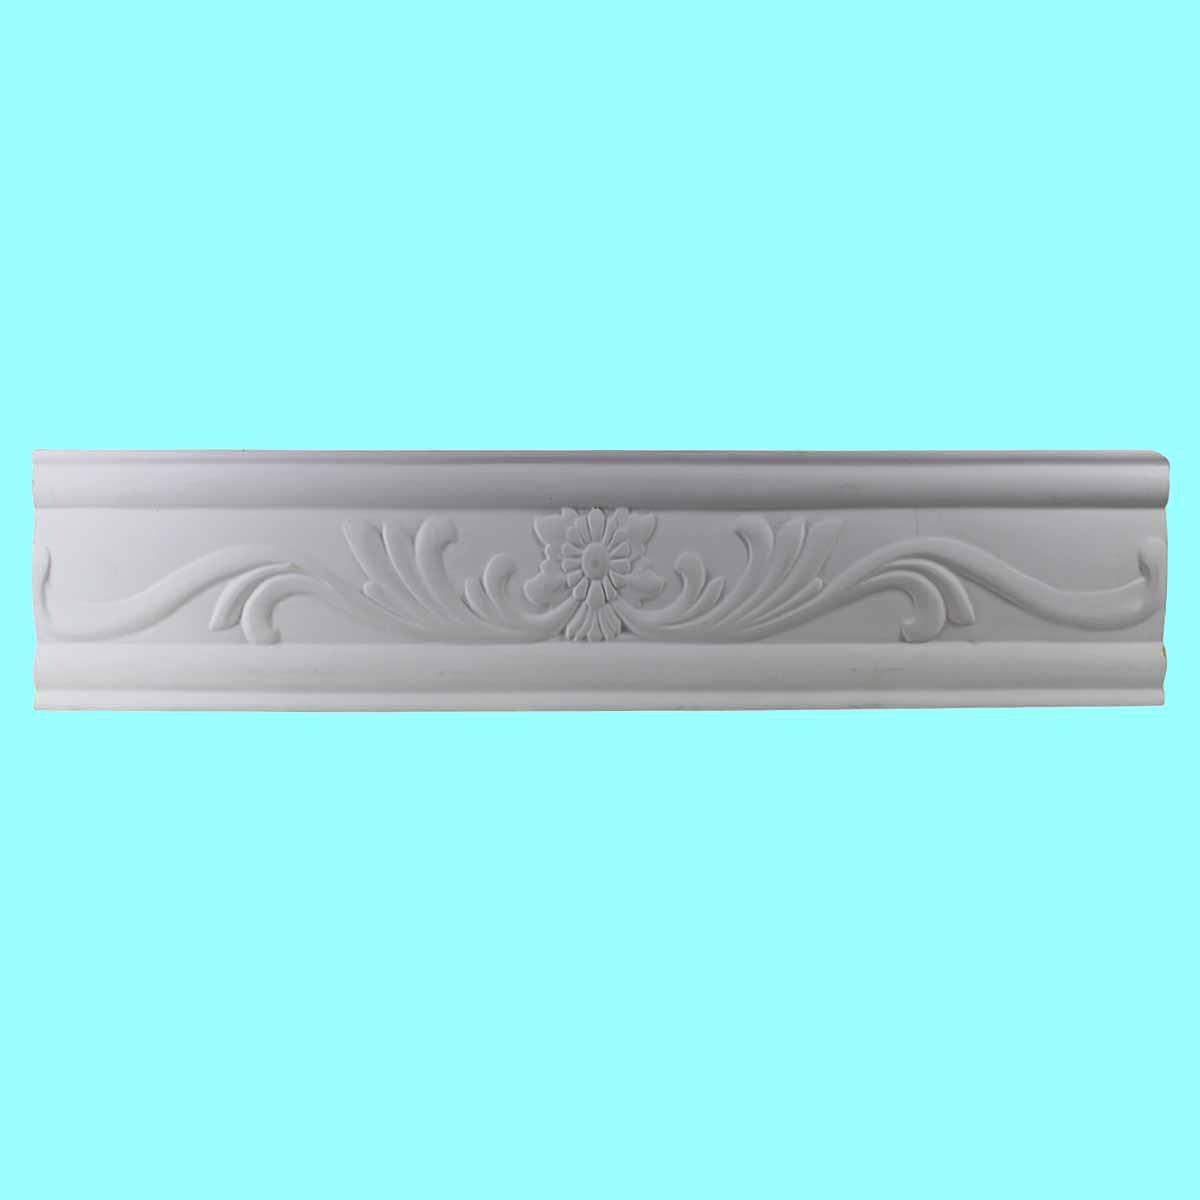 Cornice White Urethane Sample of 10511 19.75 Long Cornice Cornice Moulding Cornice Molding